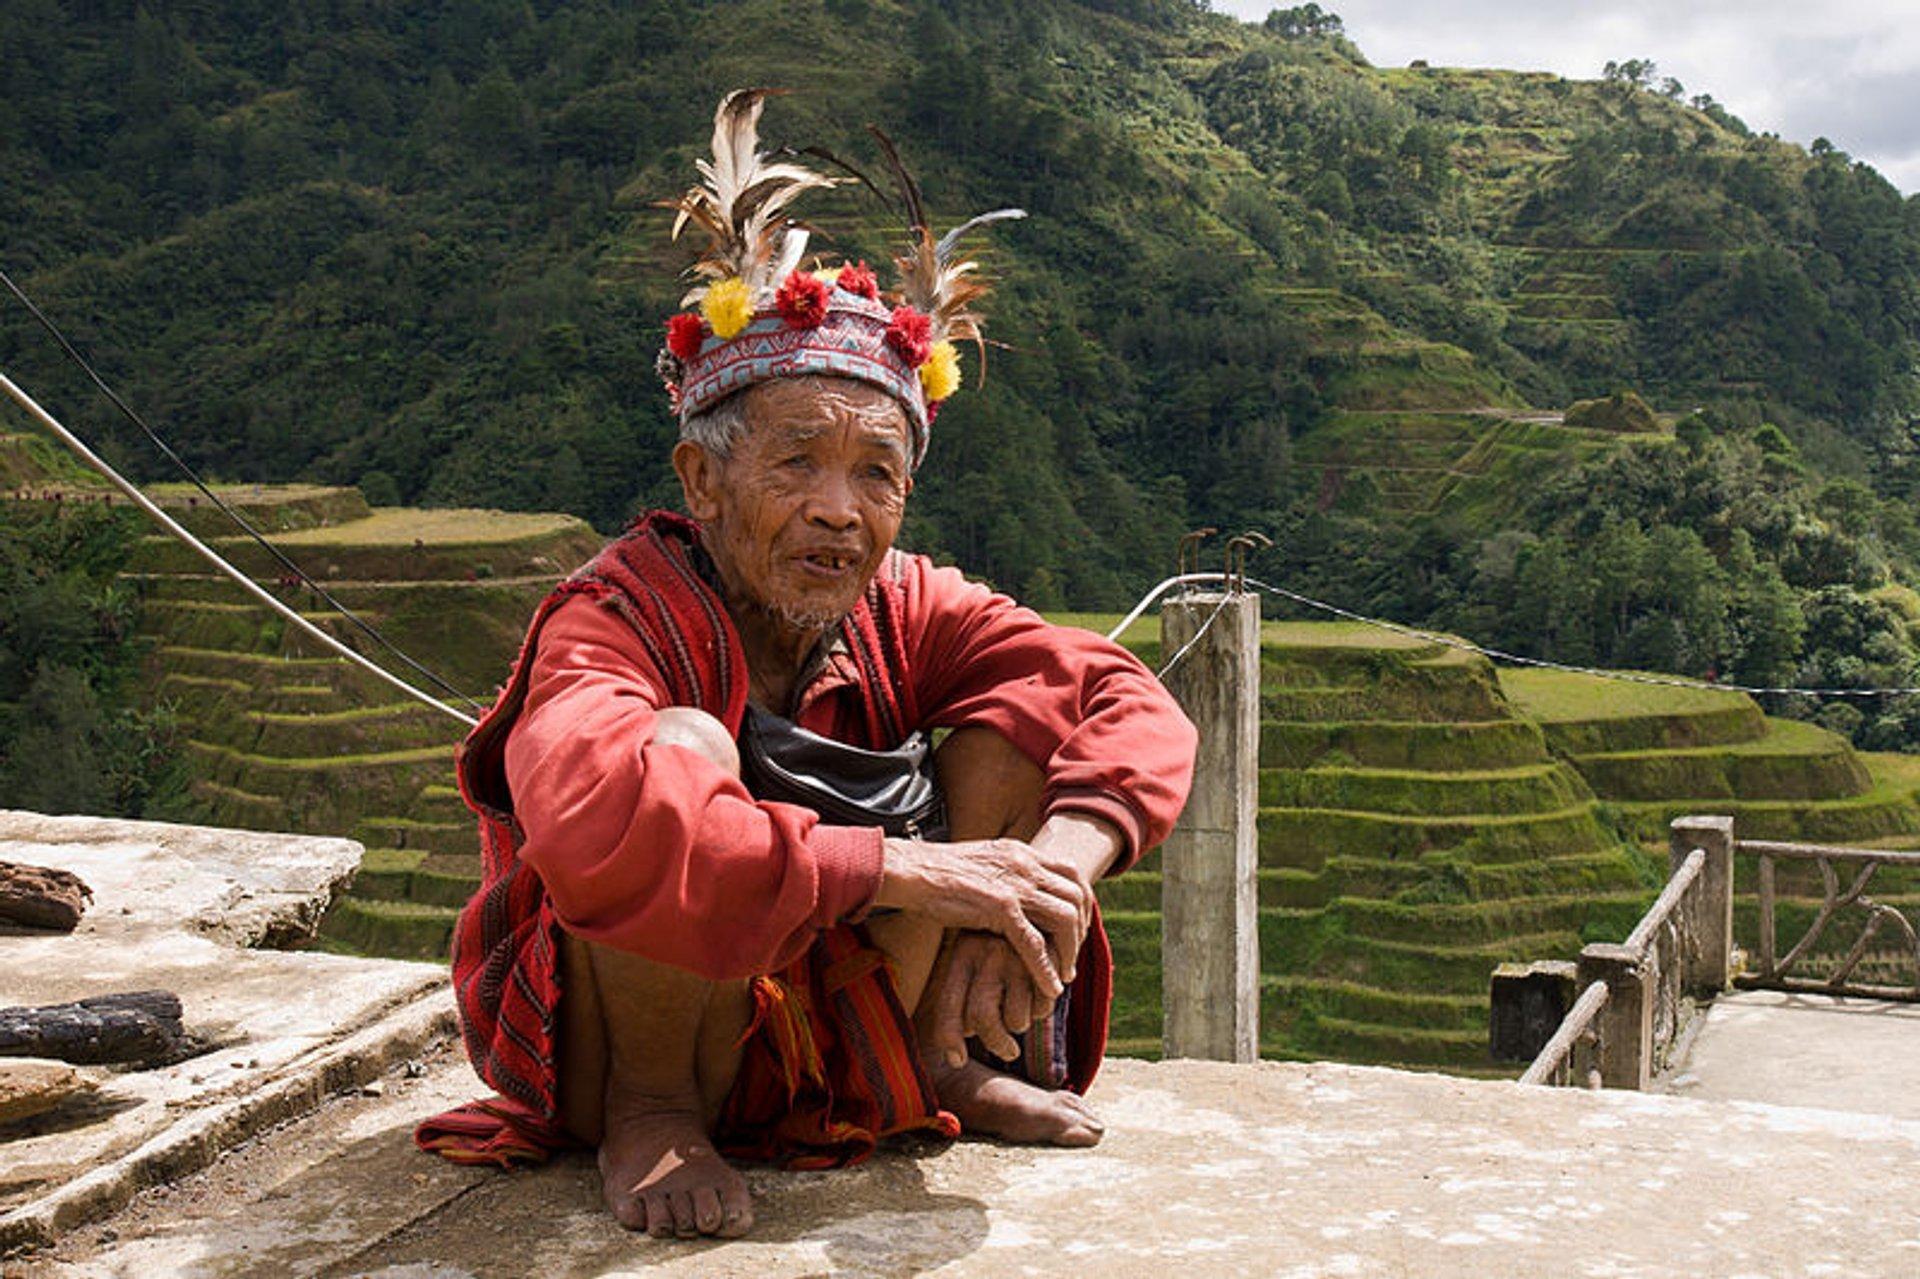 Ifugao Mumbaki in Philippines 2020 - Best Time